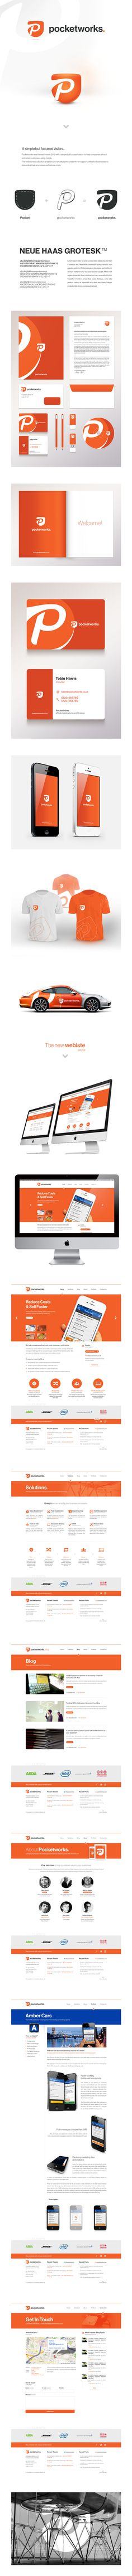 Pocketworks / Tomasz Zagórski | #stationary #corporate #design #corporatedesign #identity #branding #marketing < repinned by www.BlickeDeeler.de | Take a look at www.LogoGestaltung-Hamburg.de